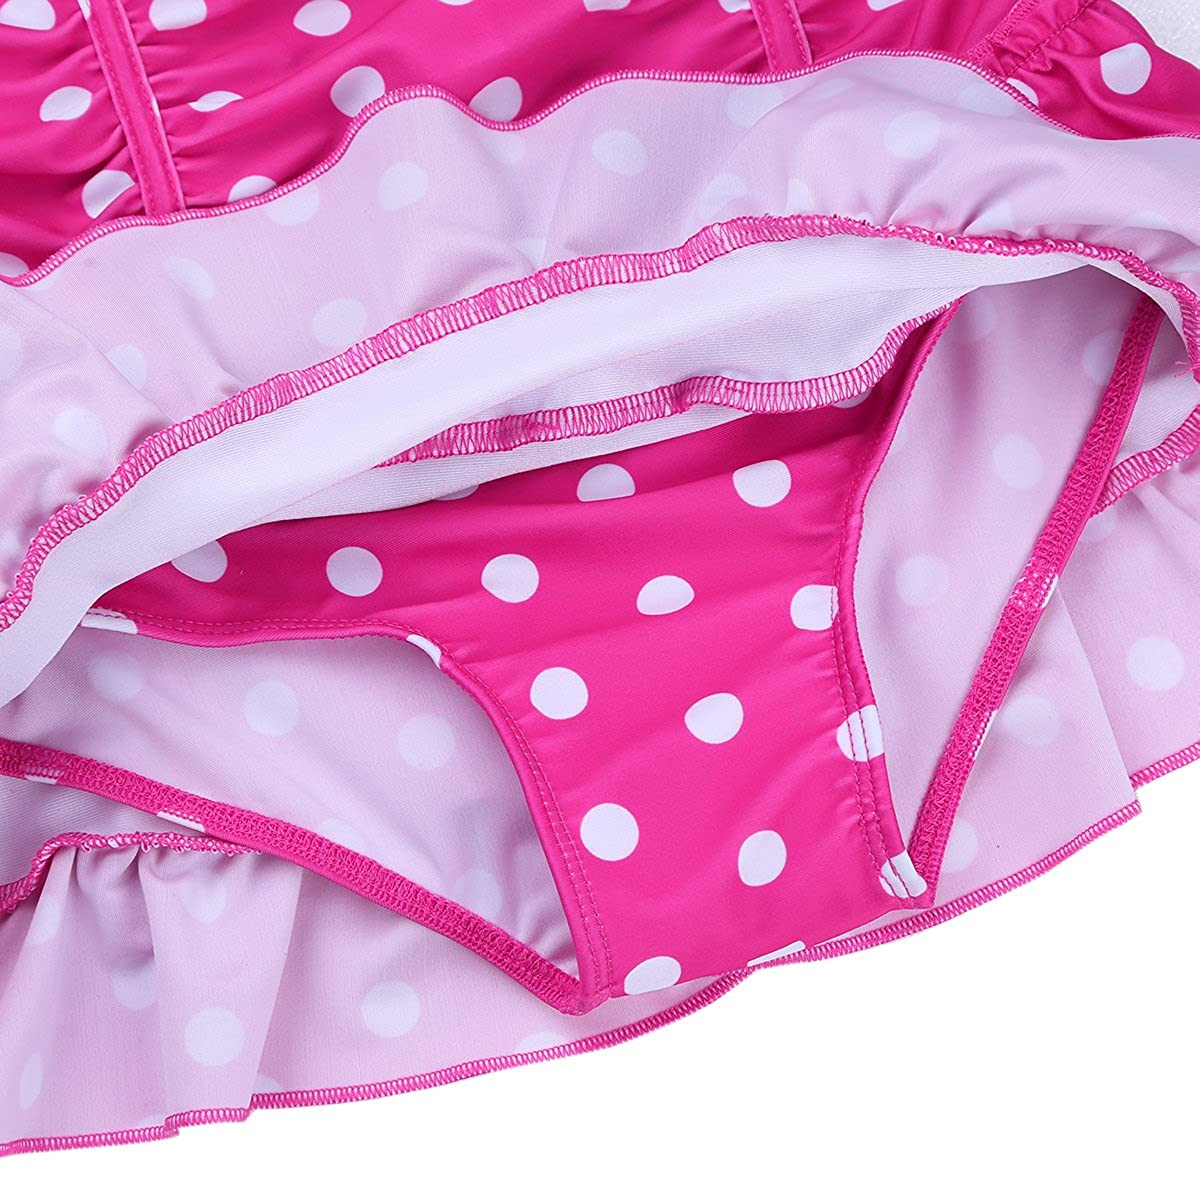 YiZYiF Enfant Fille Maillot /à Pois Tutu Robe de Bain Licou Tankini Combinaison Justaucorps de Bain Body de Sport V/êtement de Natation Robe Plage Bikini 3-14 Ans